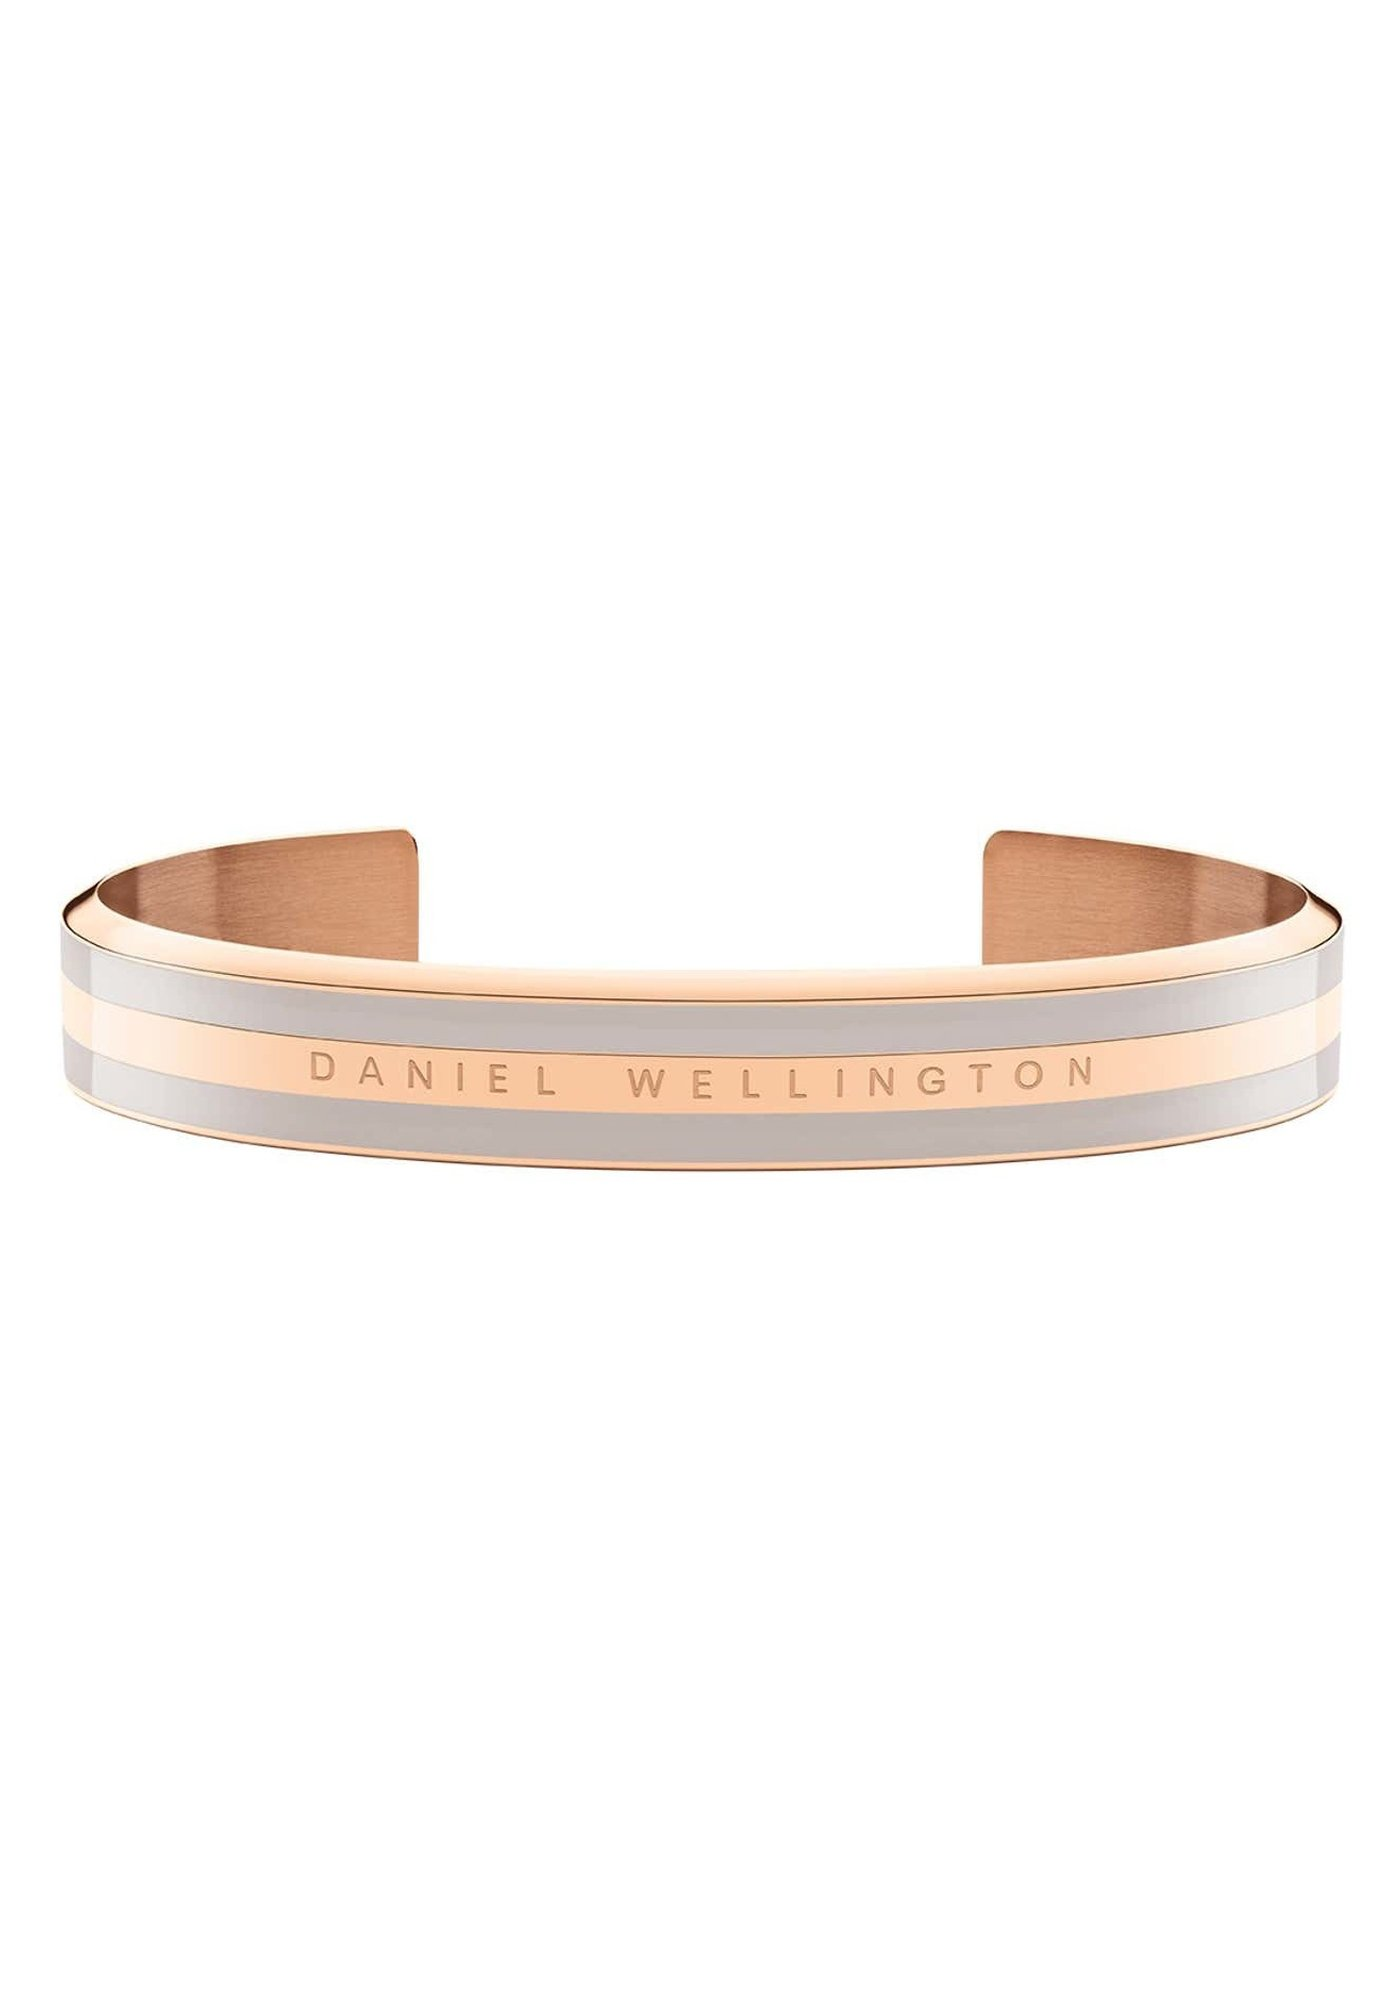 Femme Classic Bracelet – Size Medium - Bracelet